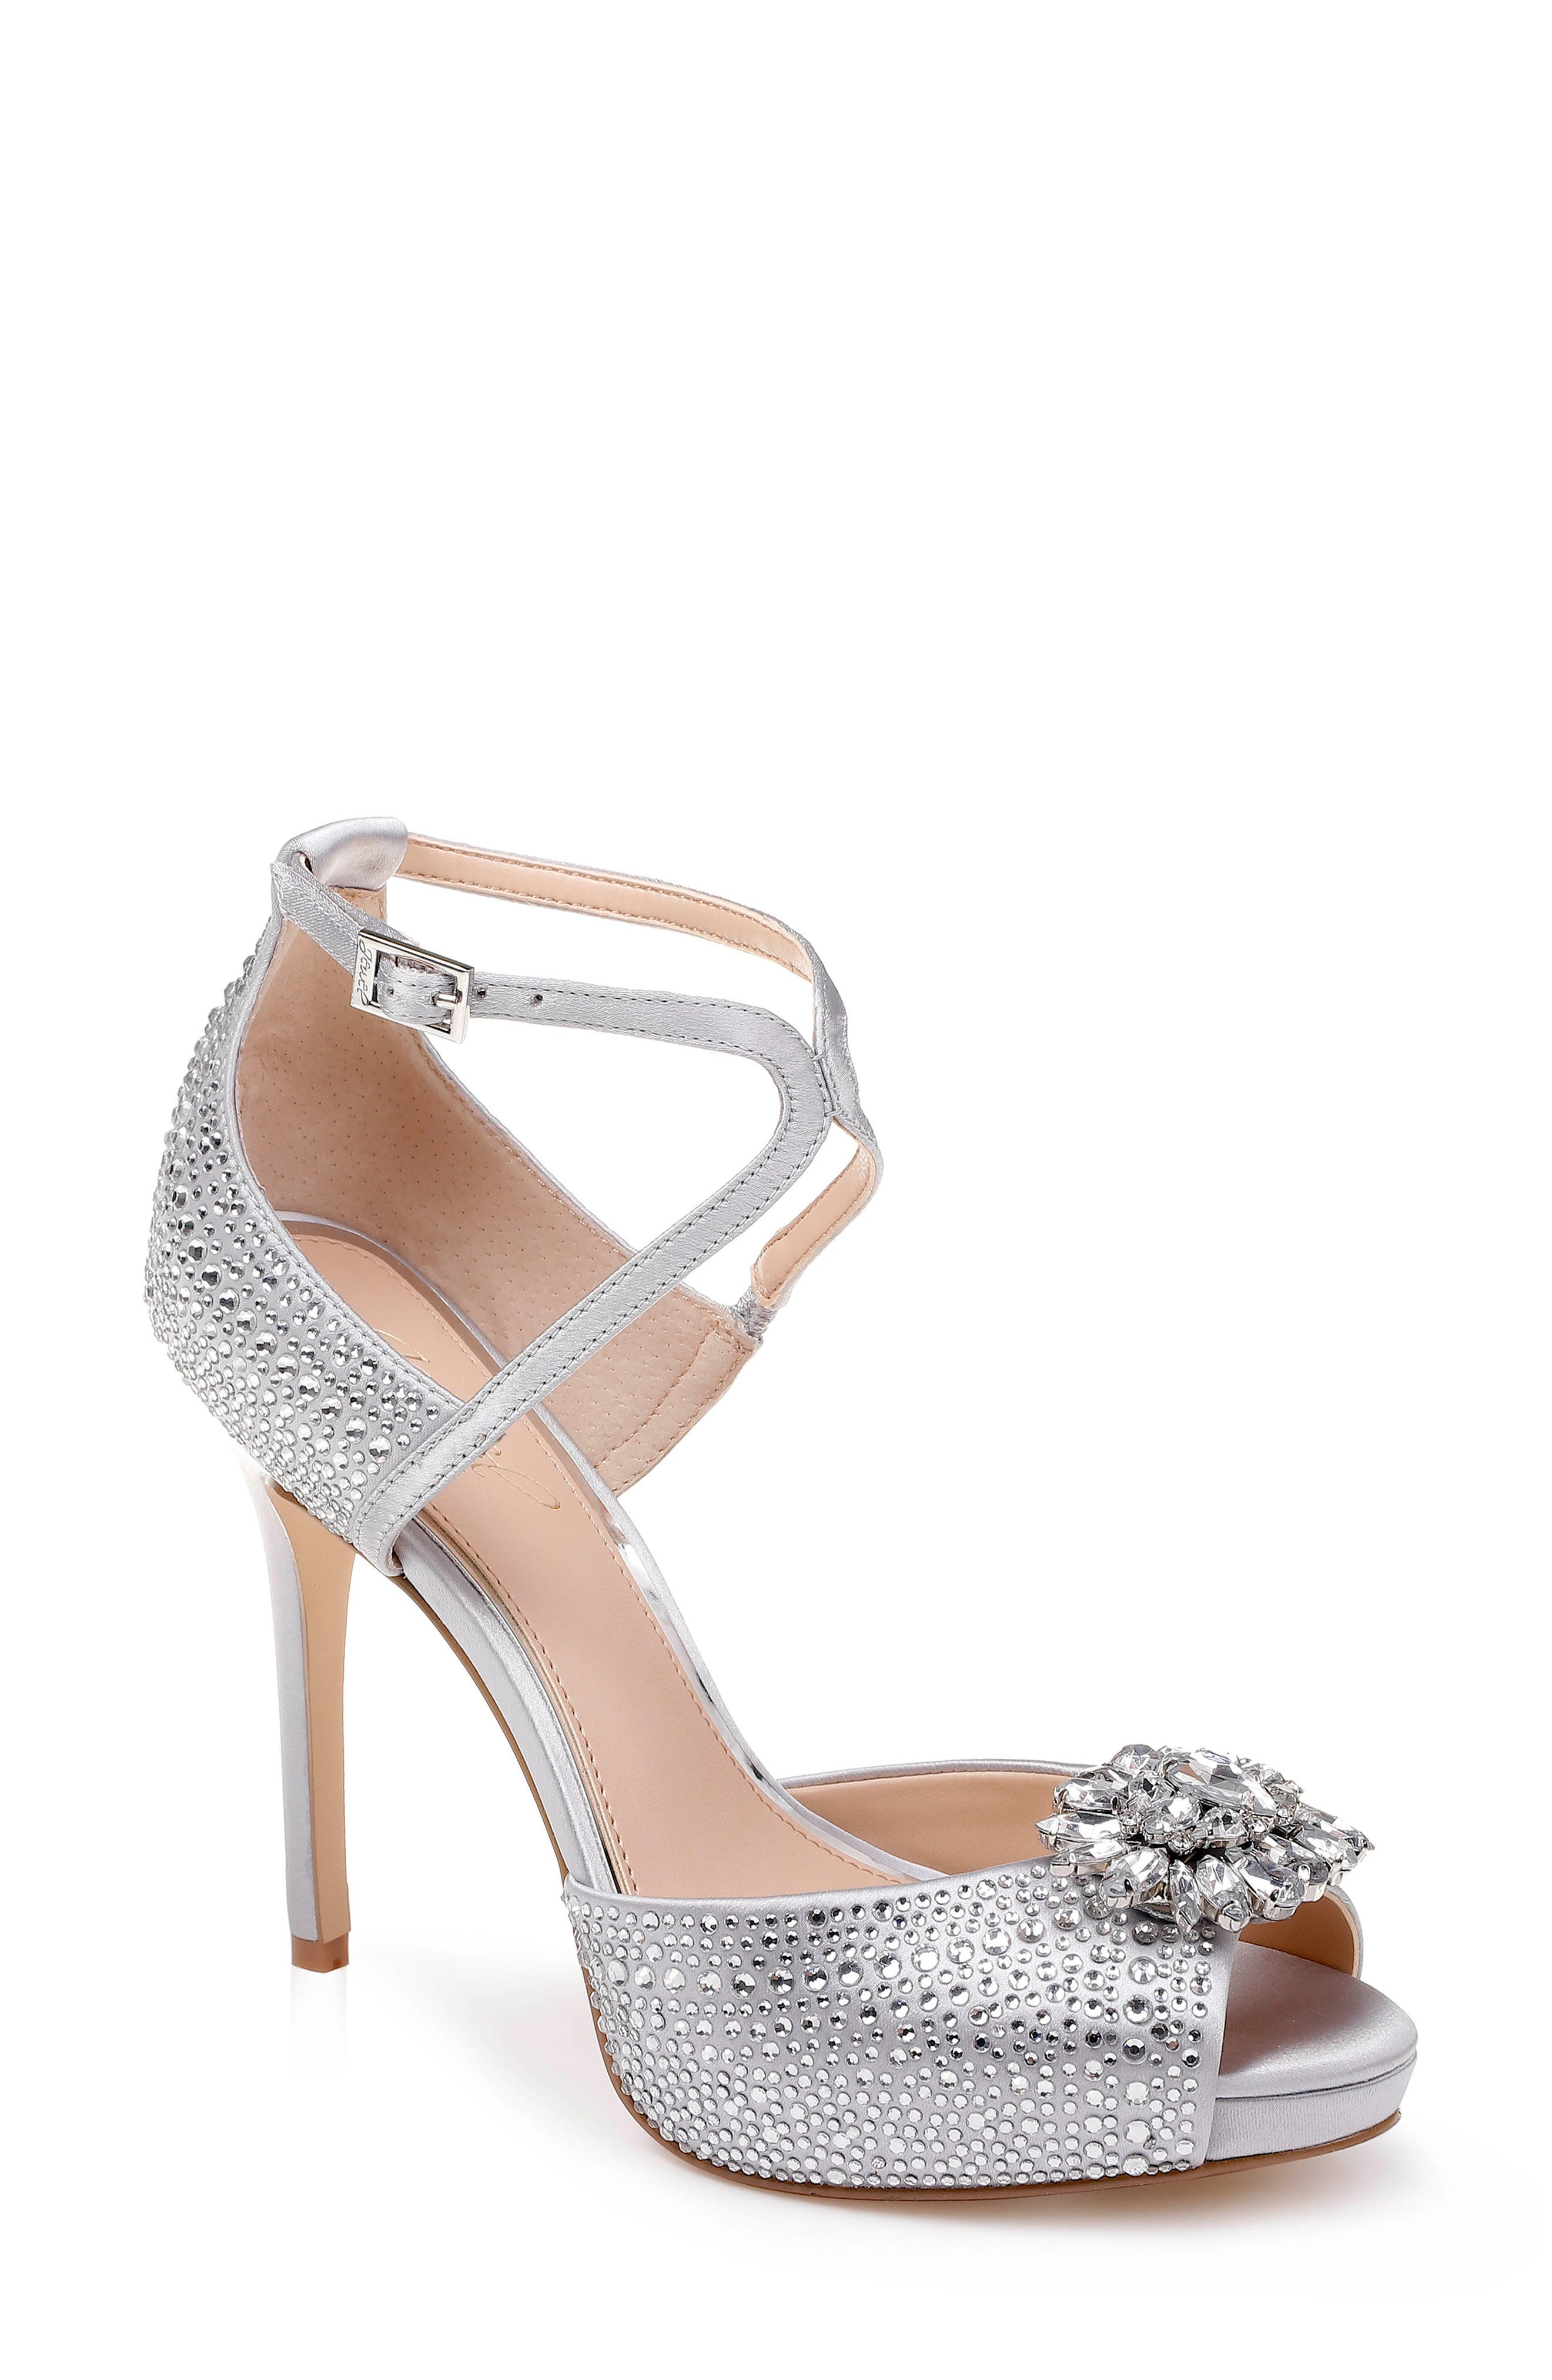 Jewel Badgley Mischka Zaina Platform Sandal- Metallic